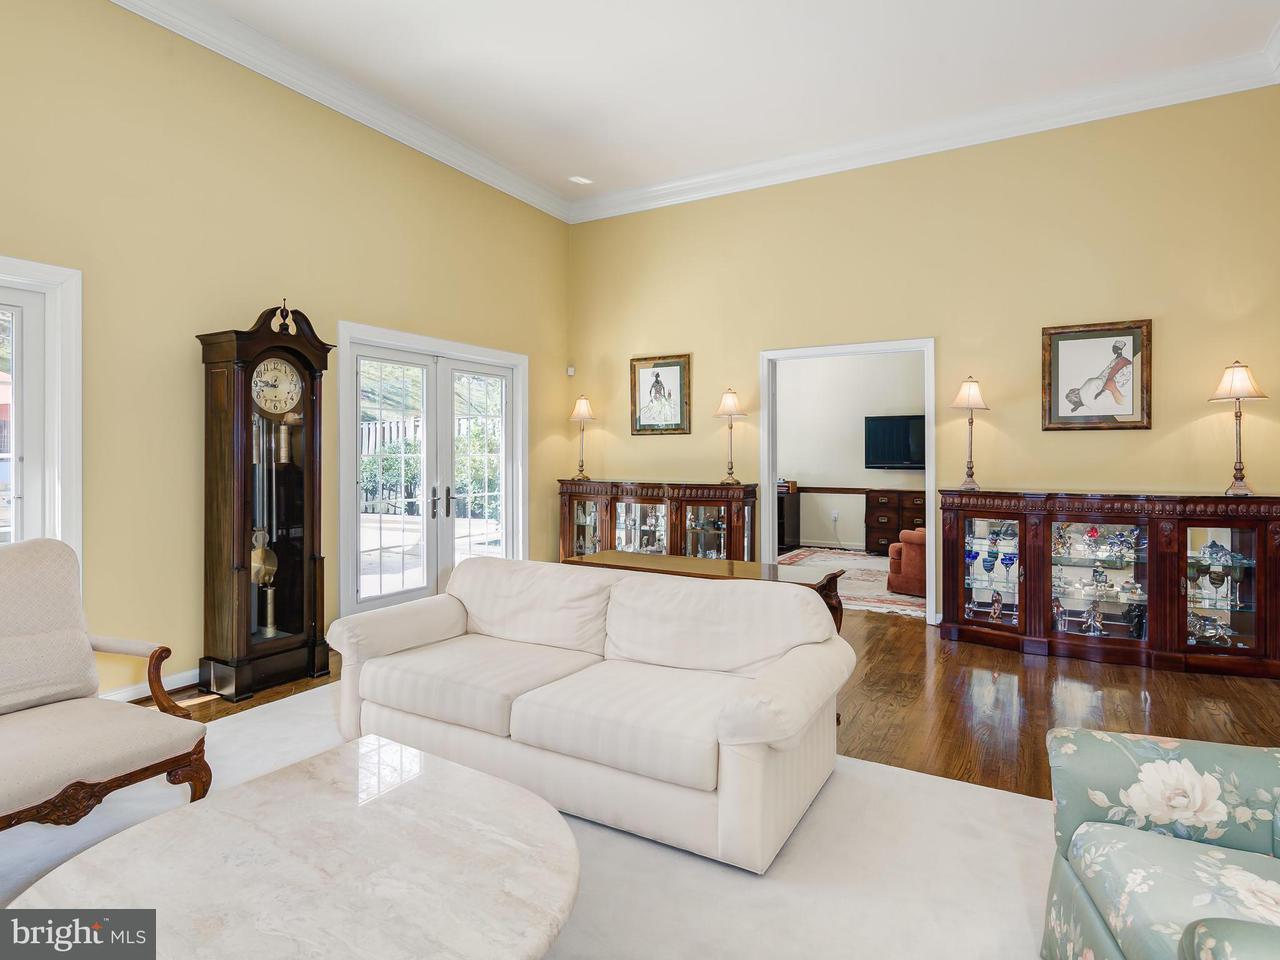 Additional photo for property listing at 2720 Unicorn Ln Nw 2720 Unicorn Ln Nw Washington, Округ Колумбия 20015 Соединенные Штаты